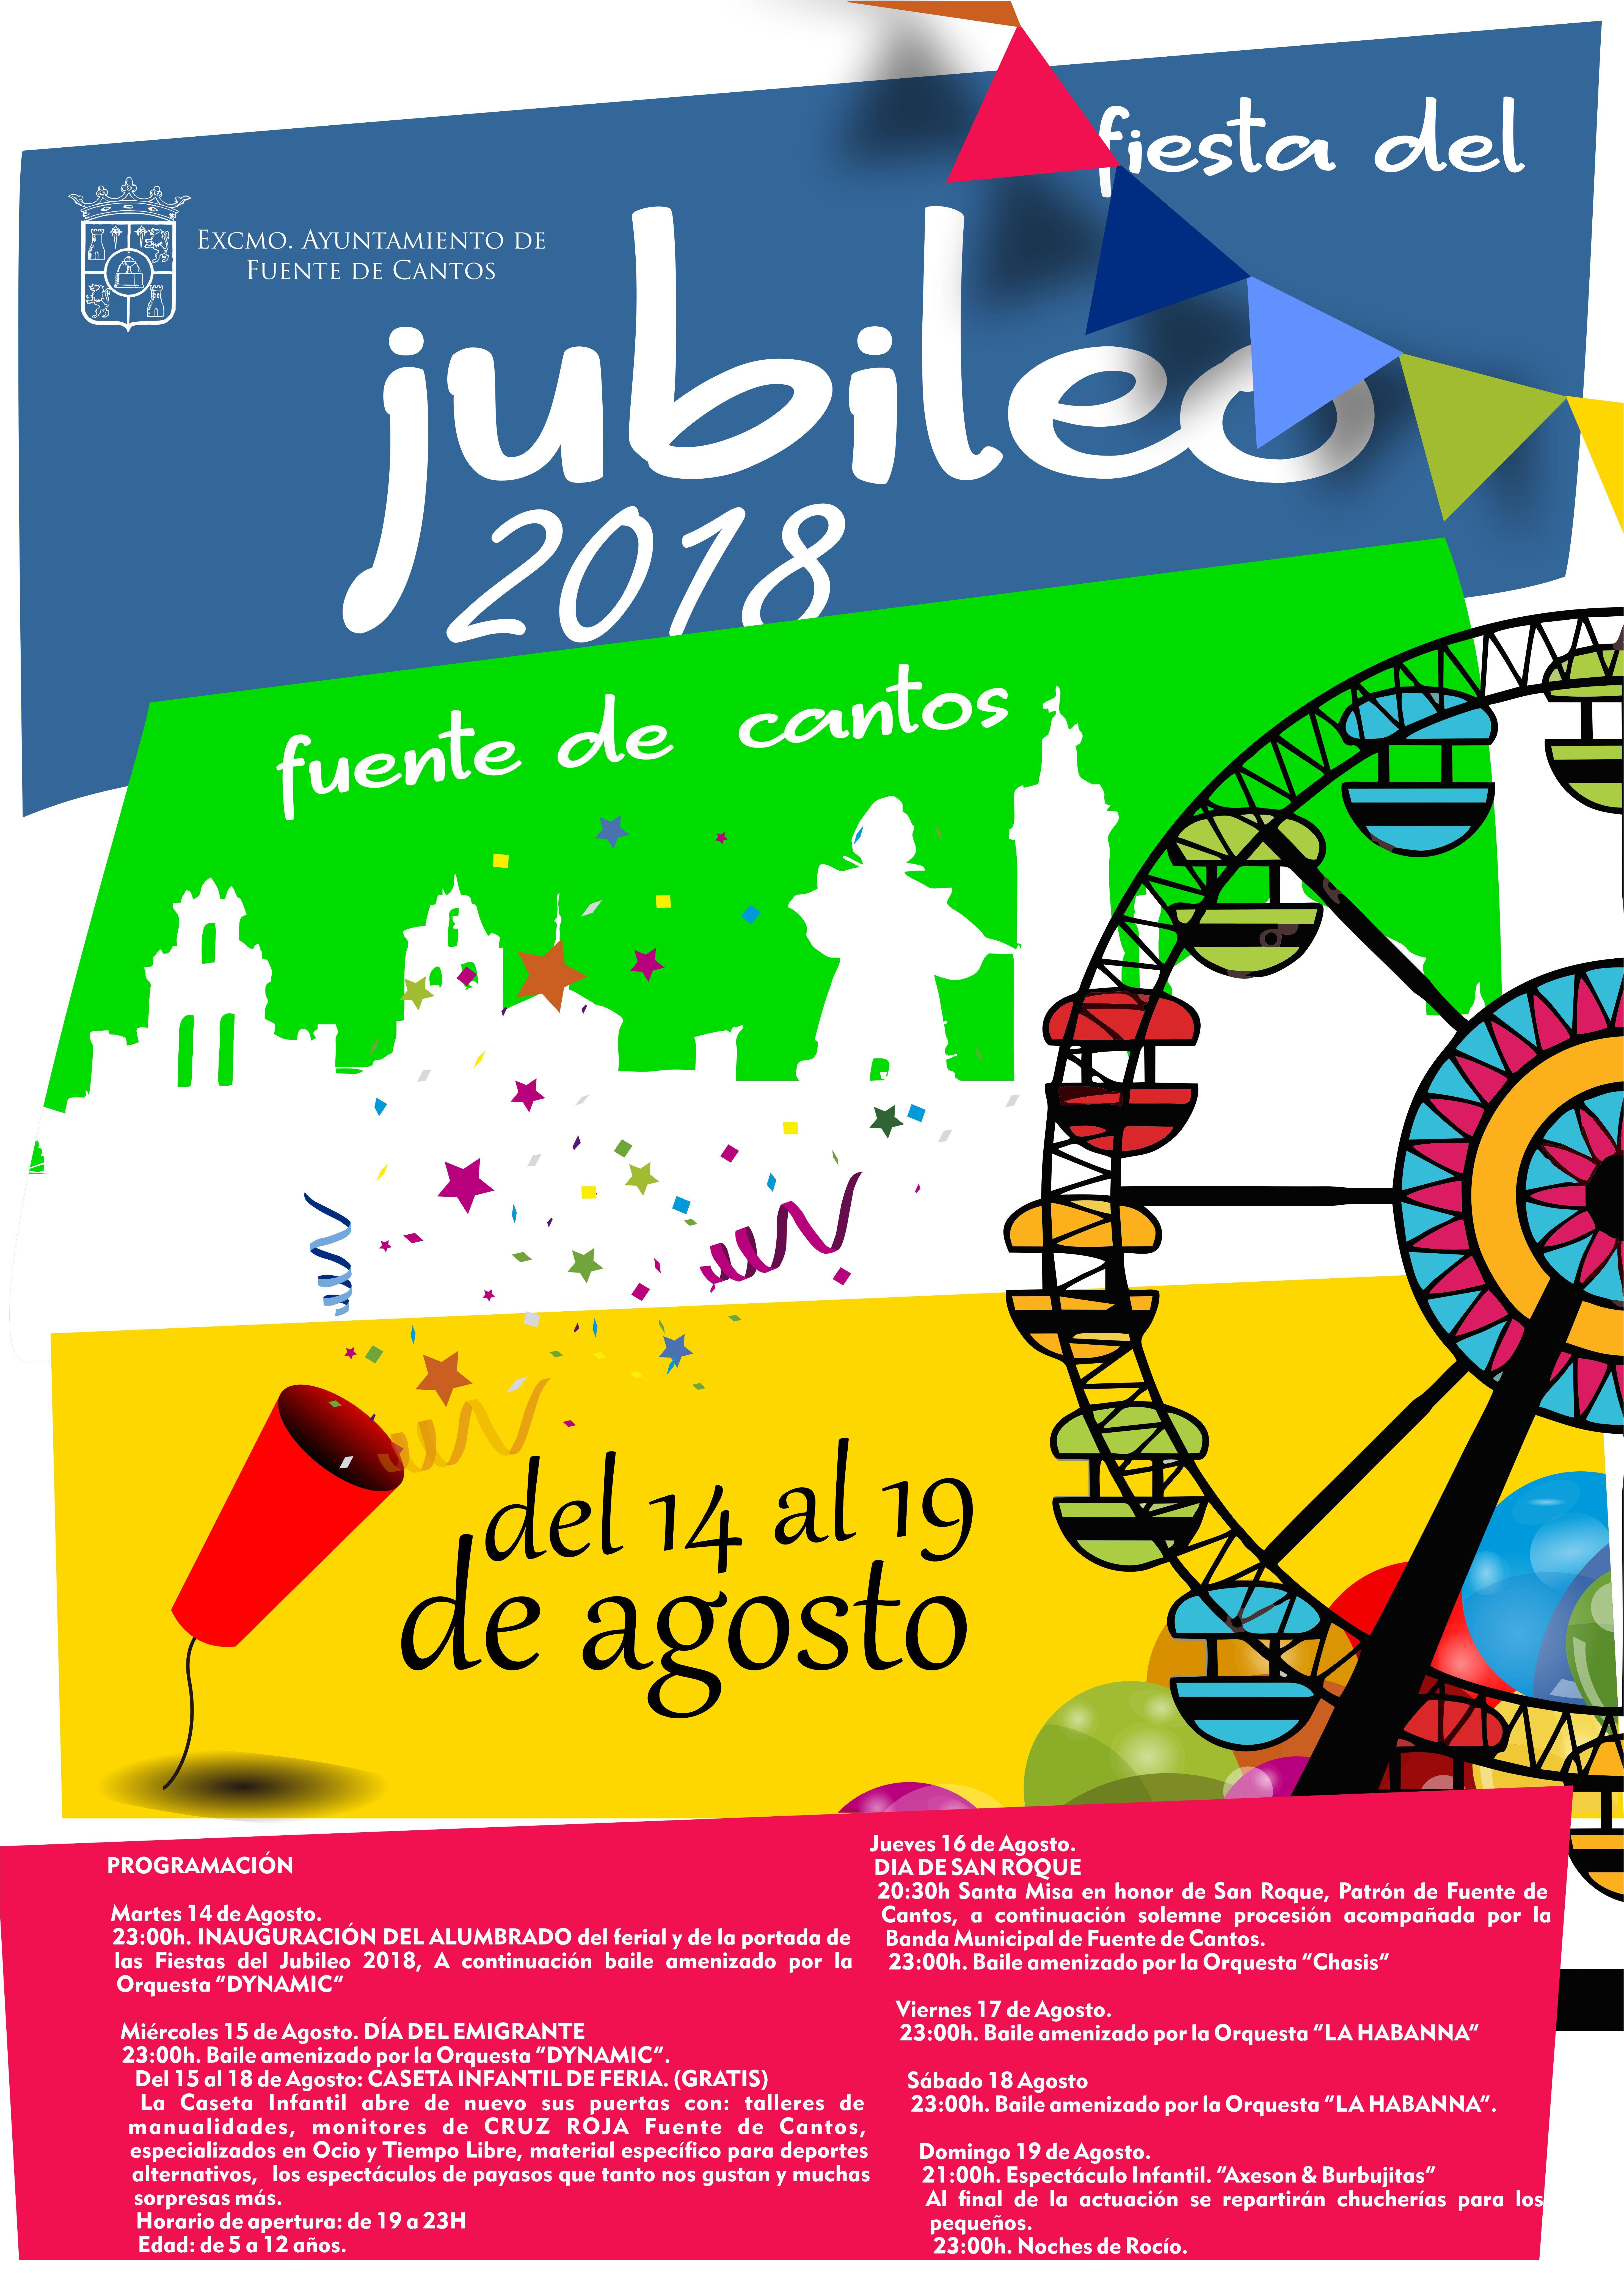 JUBILEO2018